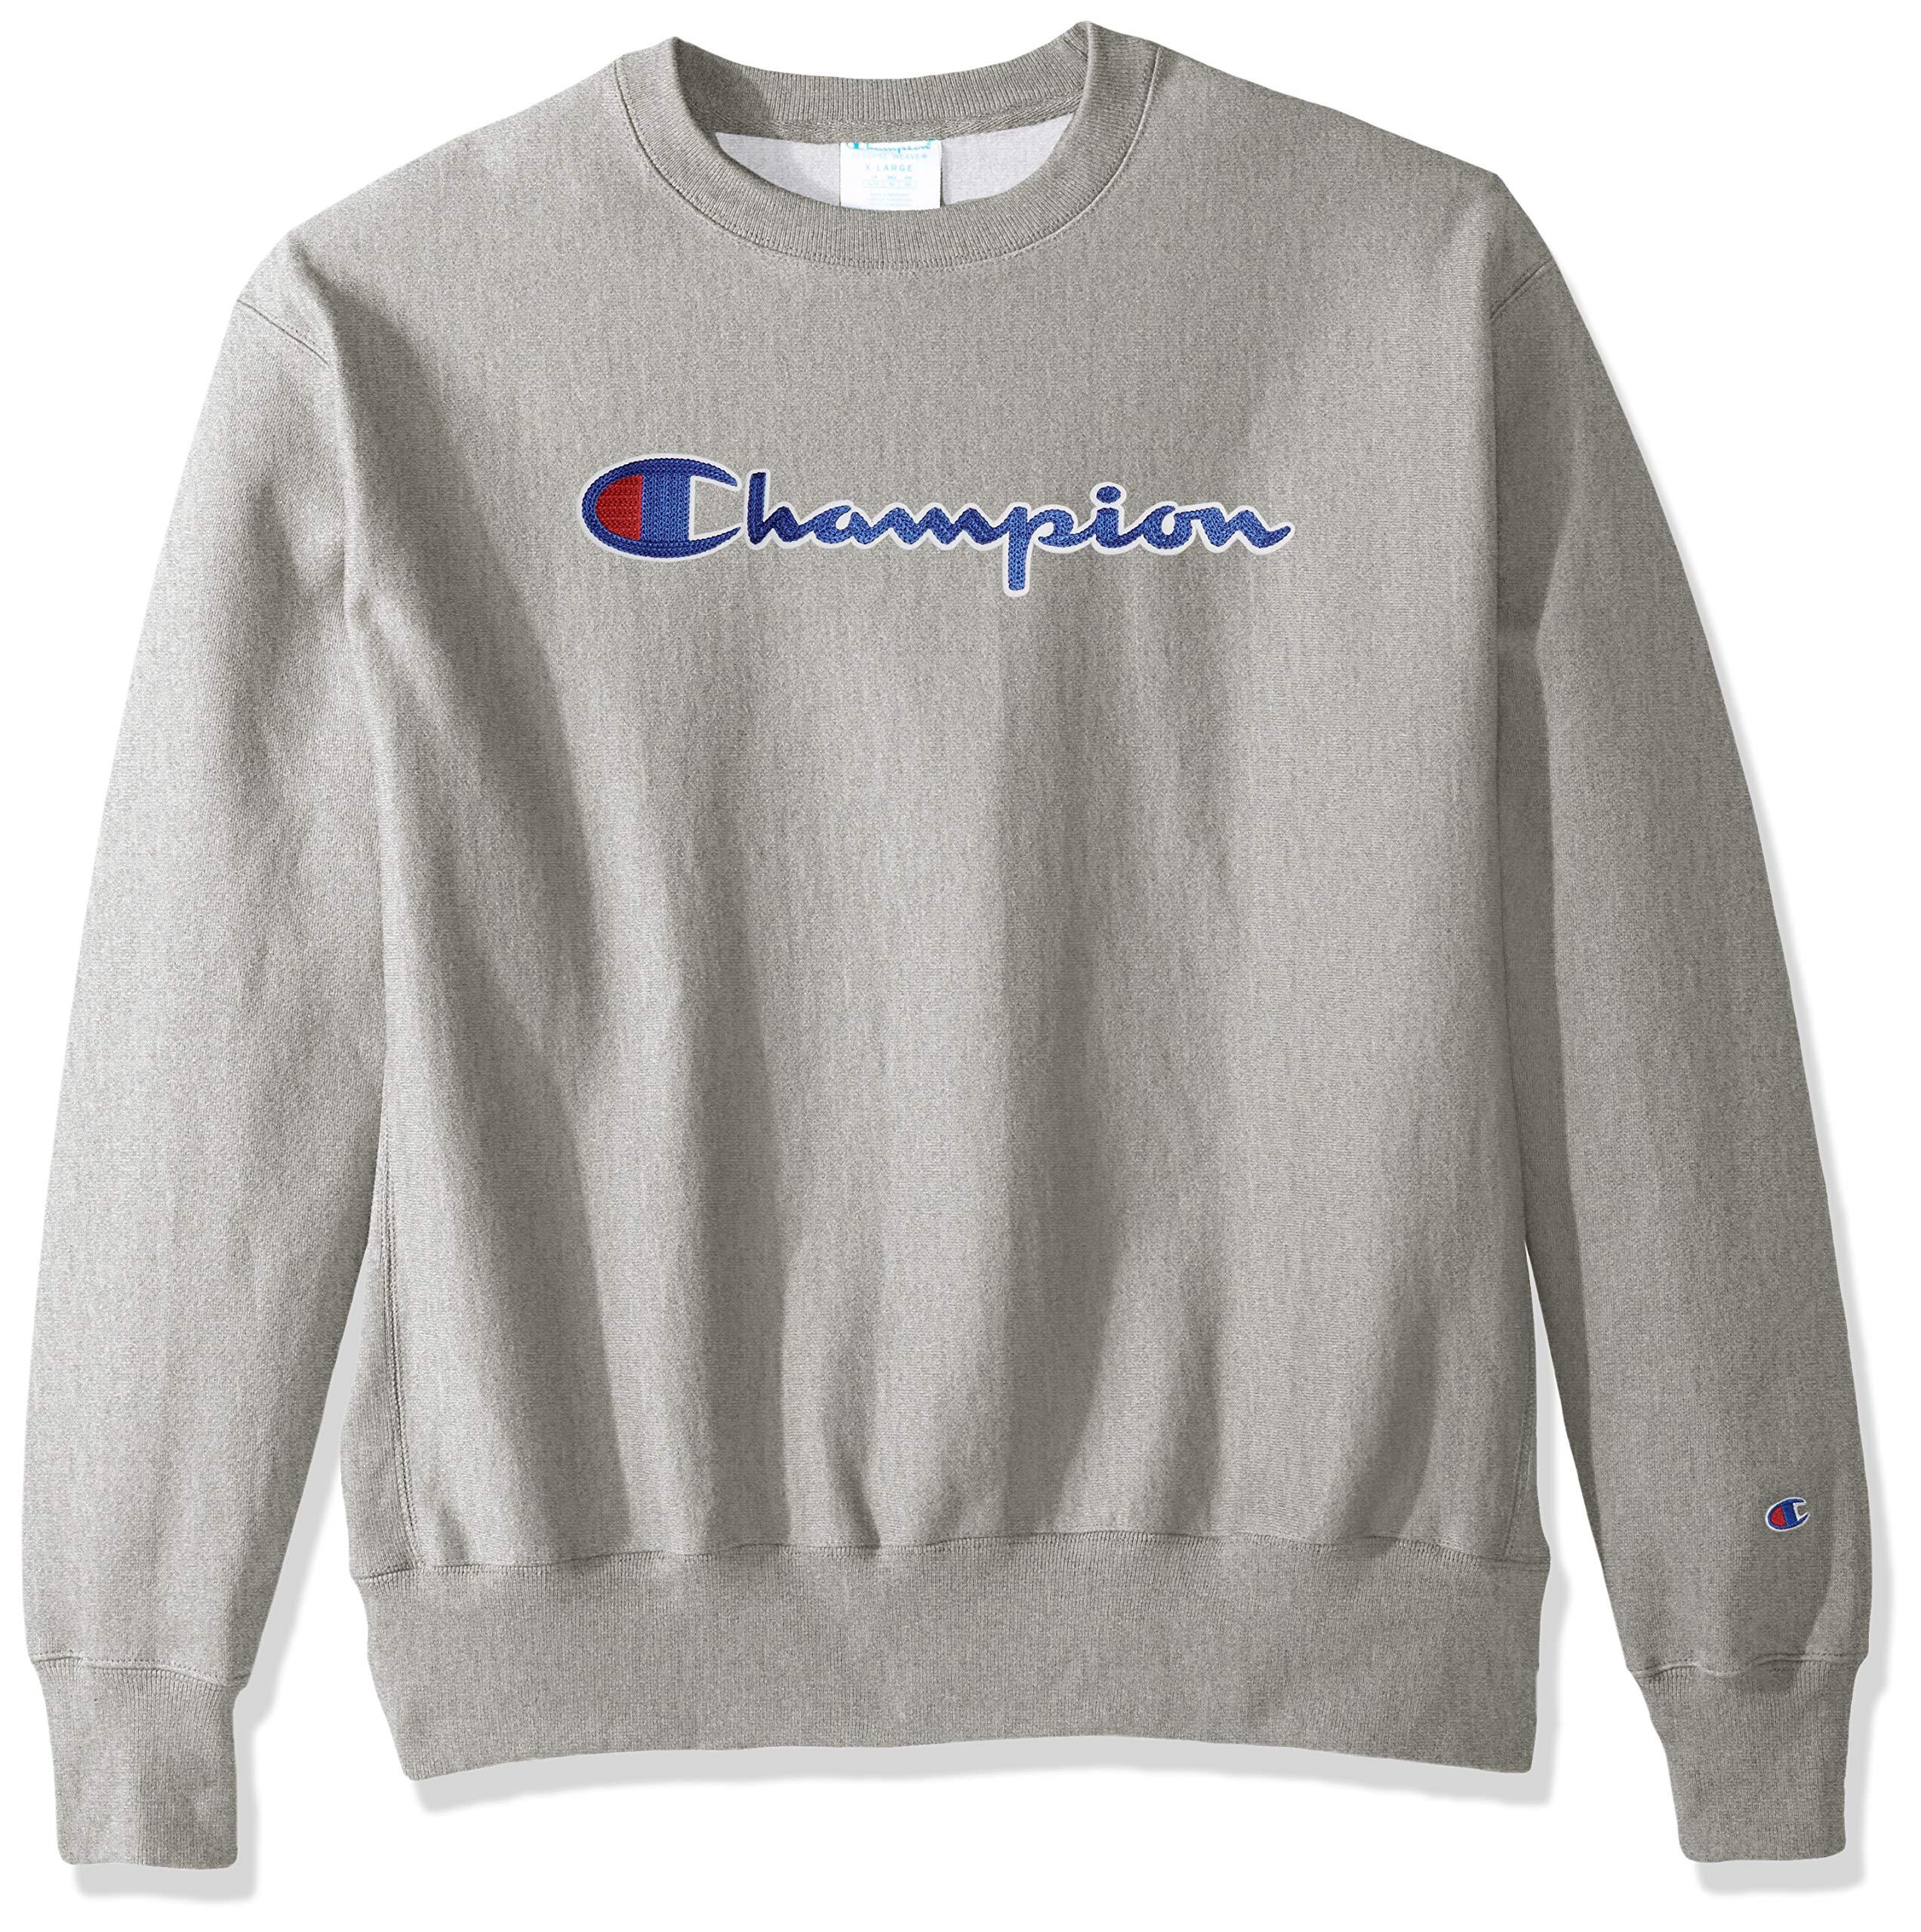 Champion LIFE Men's Reverse Weave Sweatshirt, Oxford Gray/CHAINSTITCH Script, Large by Champion LIFE